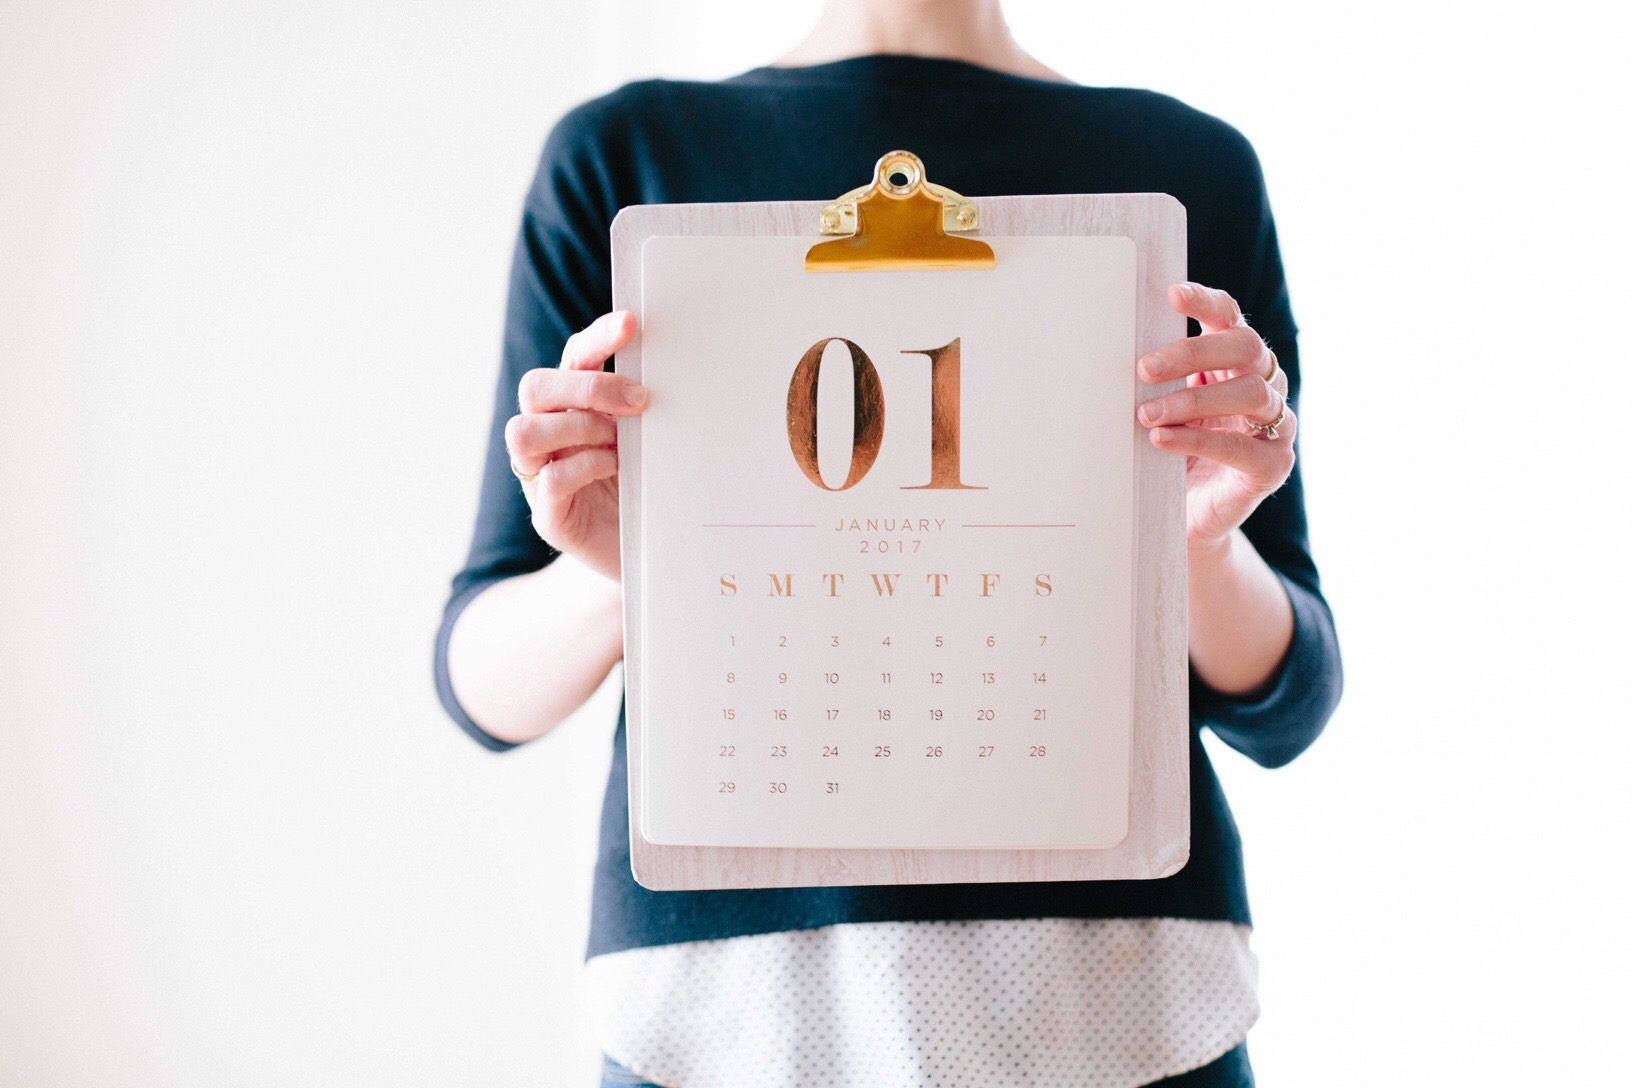 Calendario tra le mani di una donna - foto in CC tatianaberlaffa.com